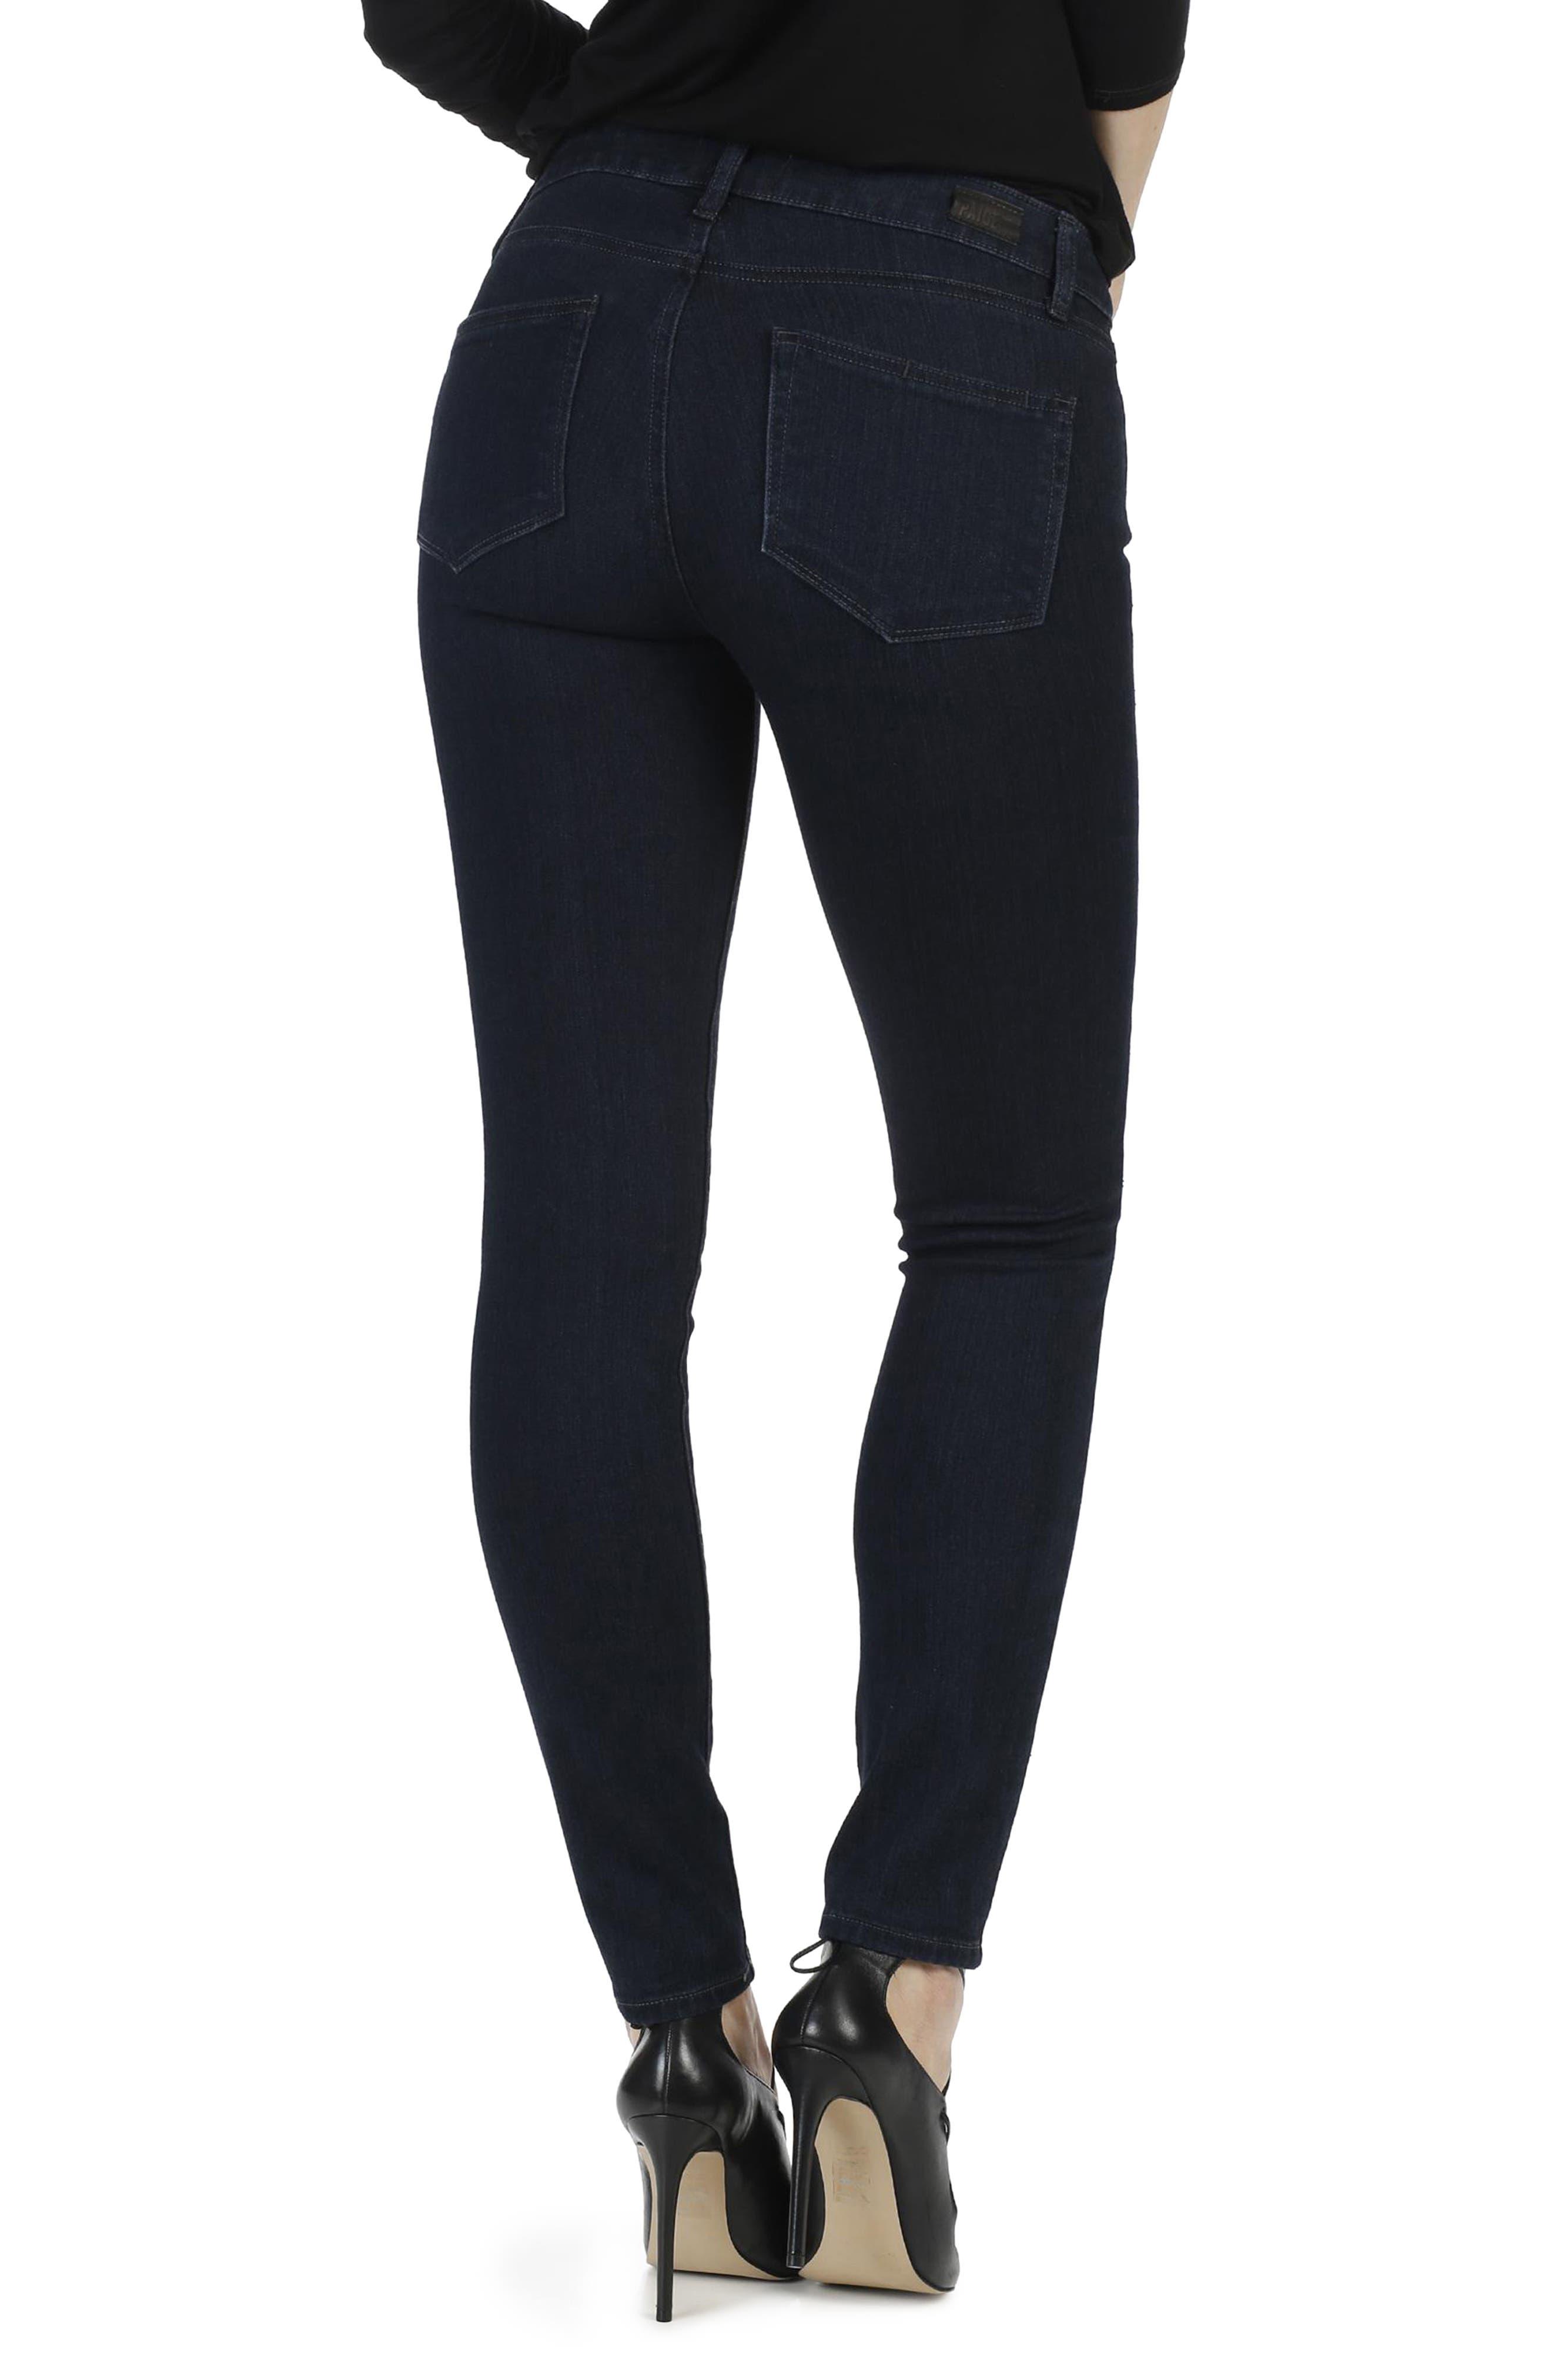 Transcend - Verdugo Ankle Ultra Skinny Jeans,                             Alternate thumbnail 3, color,                             400